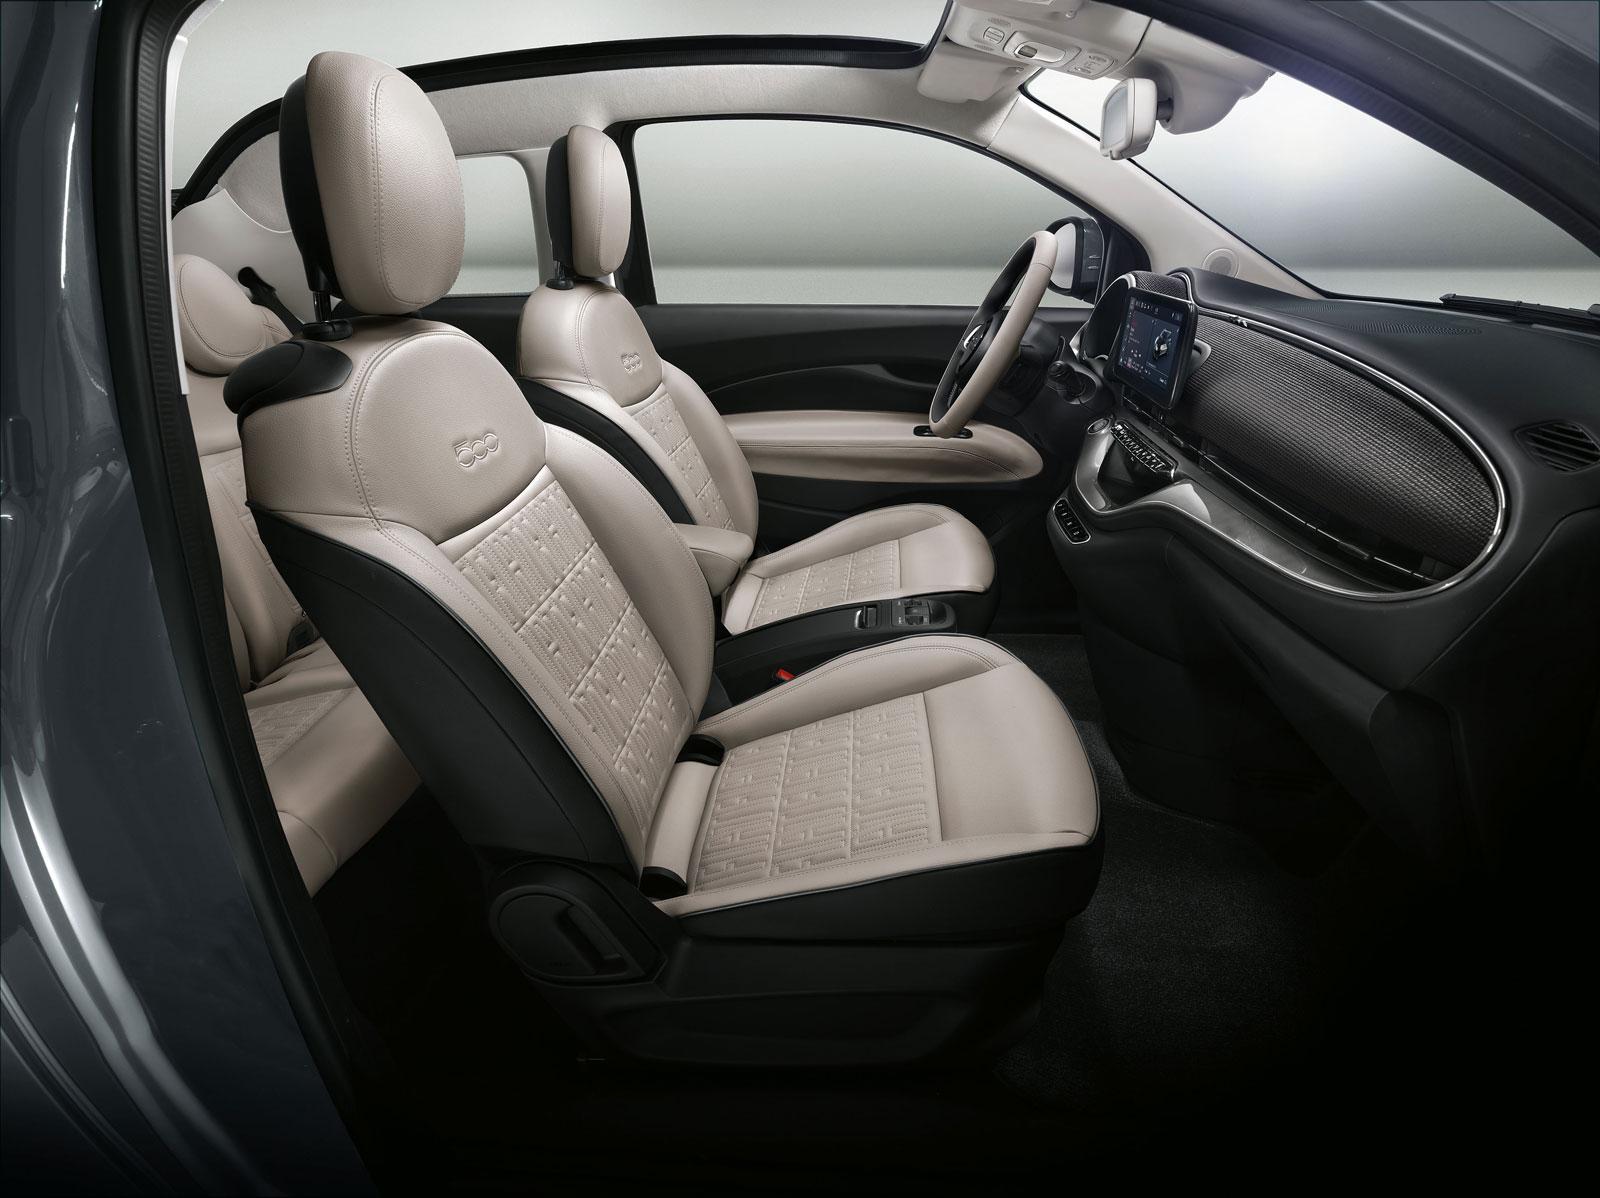 Uitgelezene New Fiat 500 Interior Design - Car Body Design ZQ-45